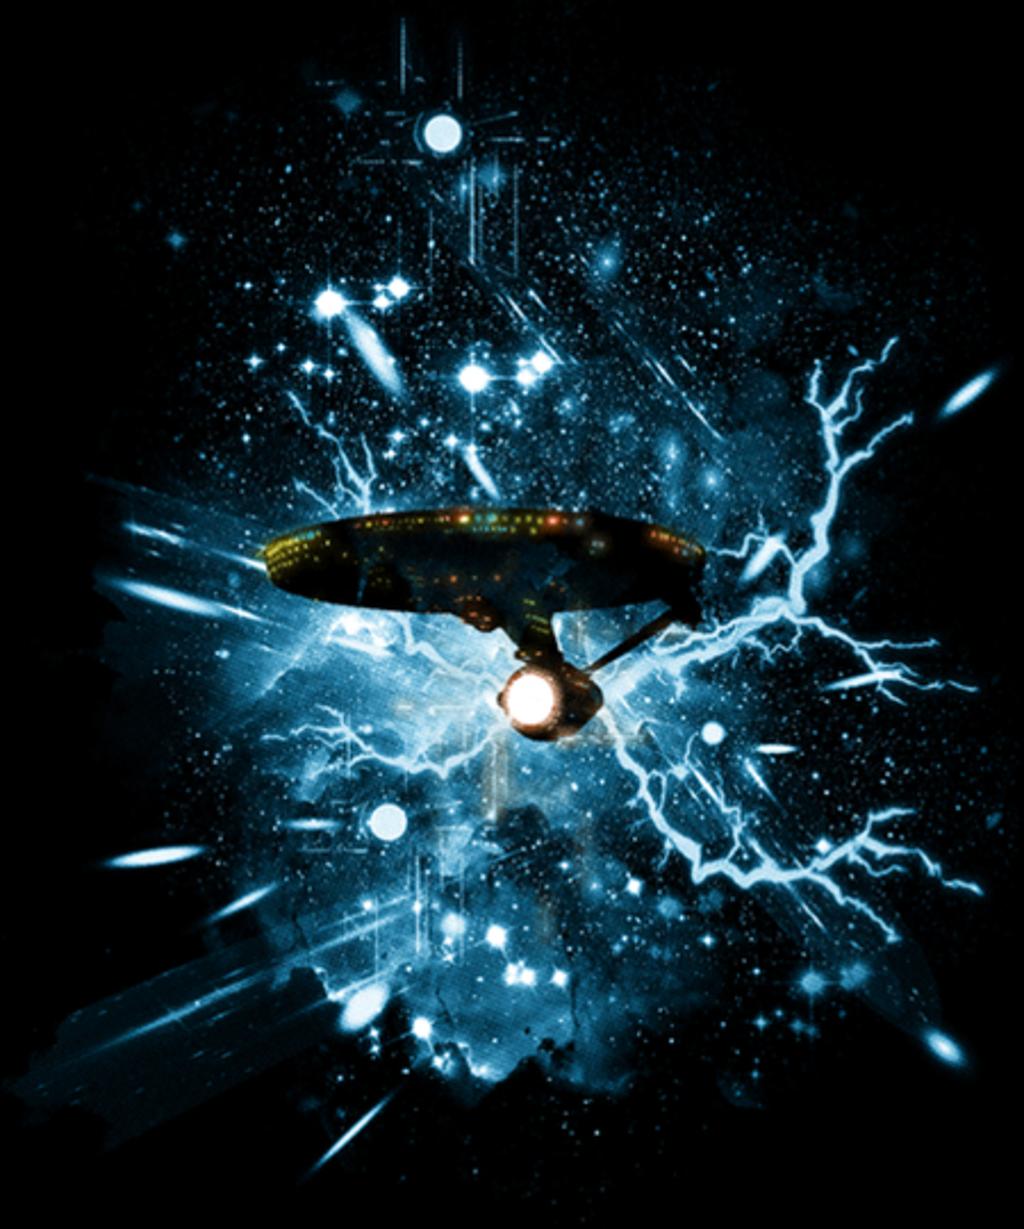 Qwertee: space trap